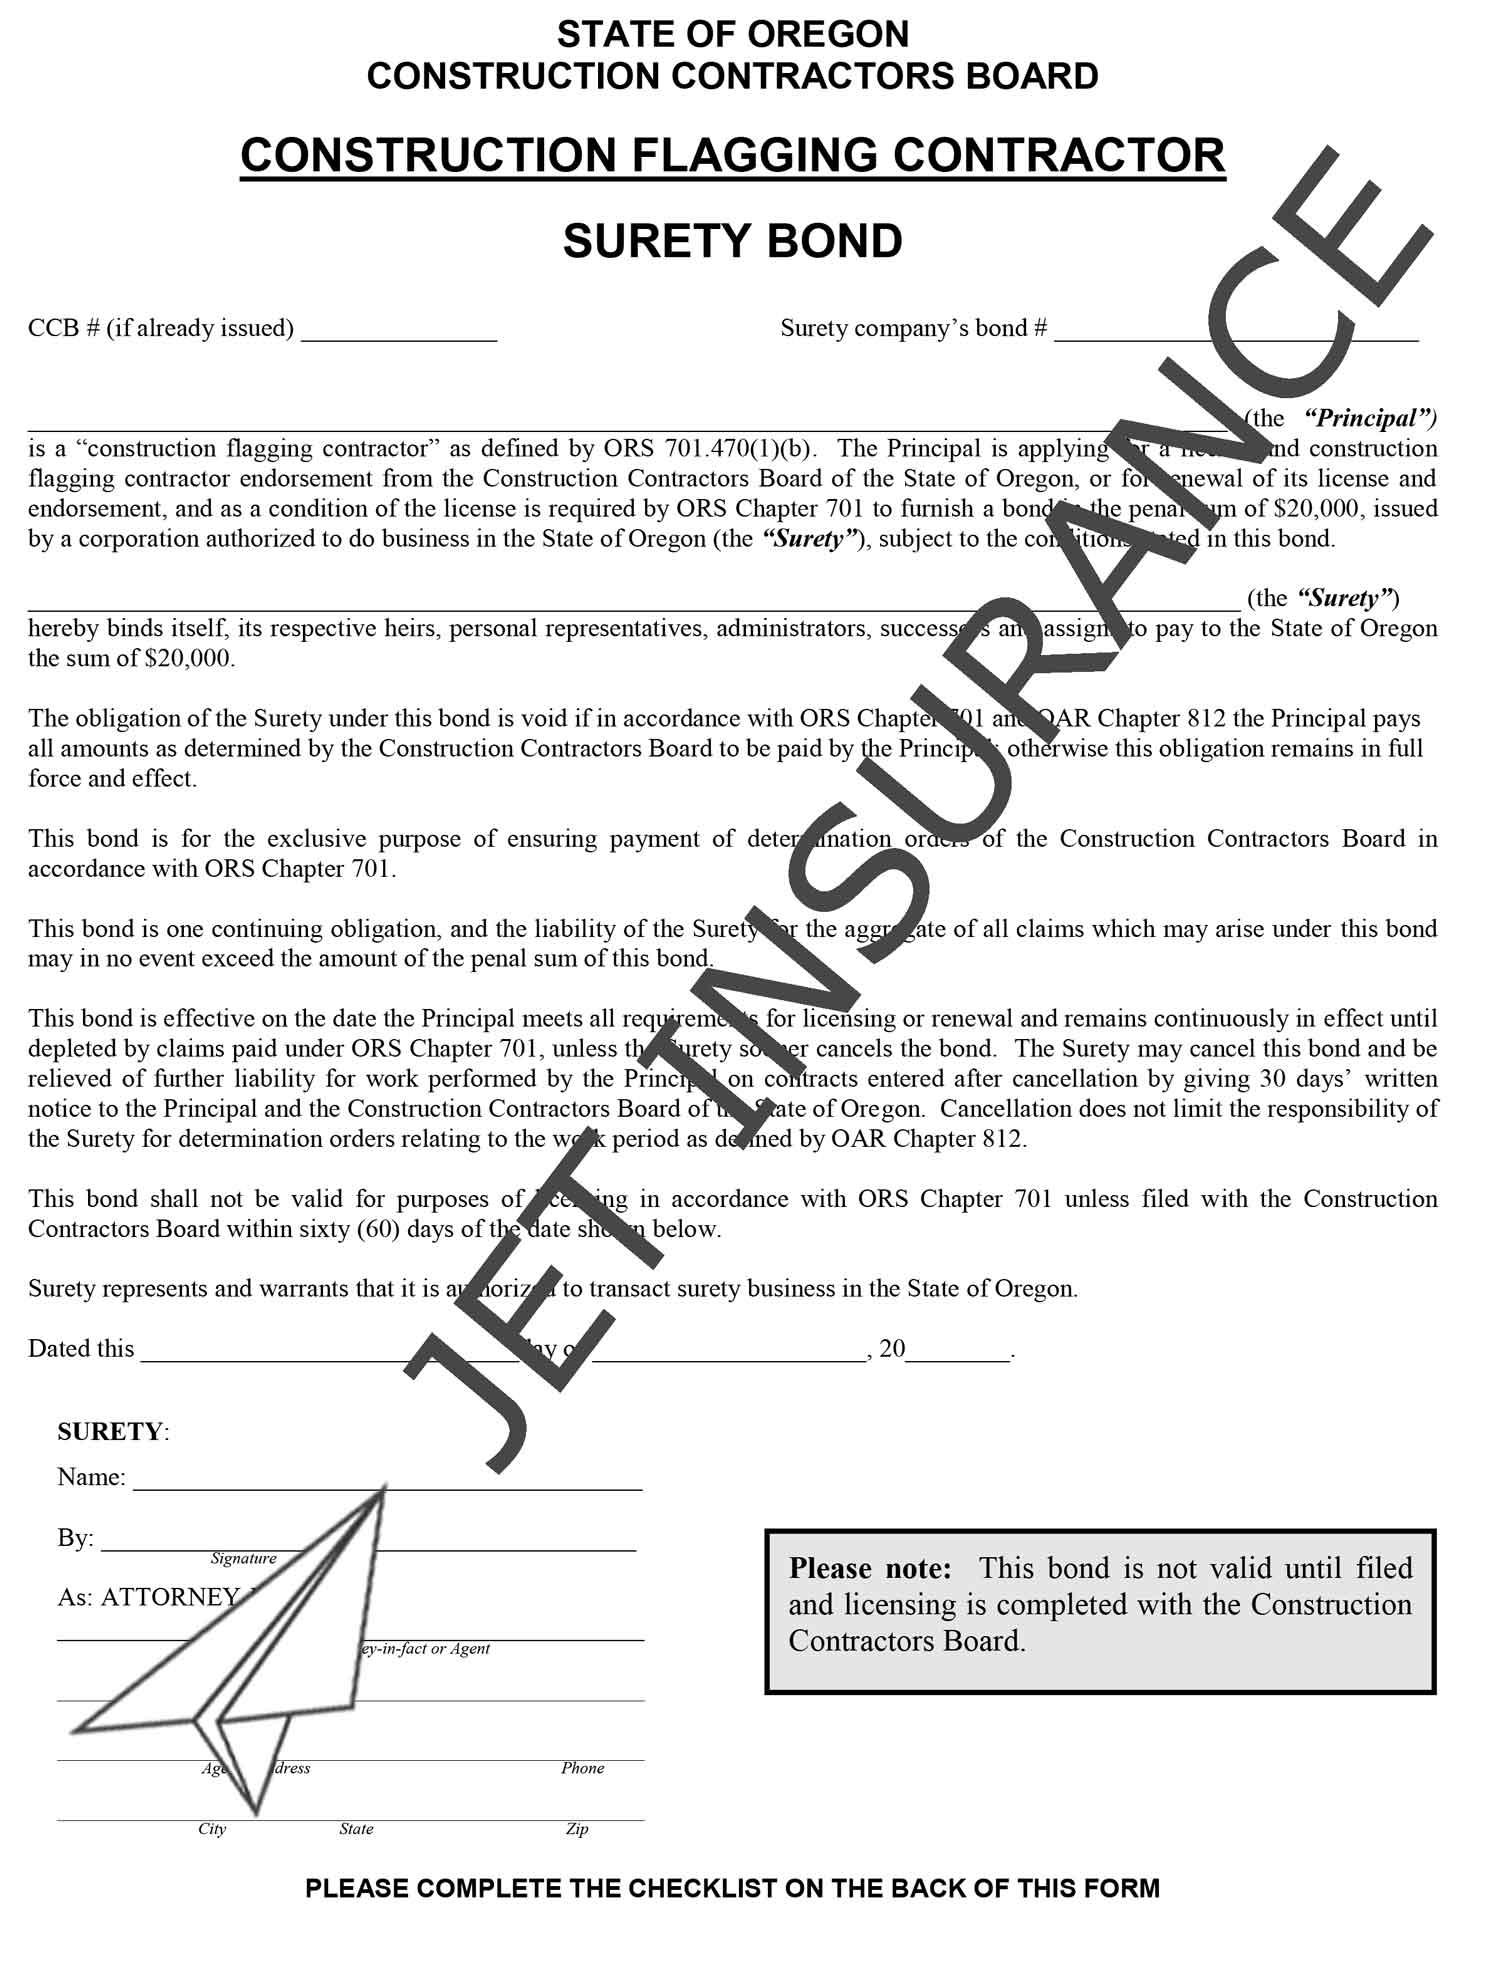 Oregon Construction Flagging Contractor Bond Form